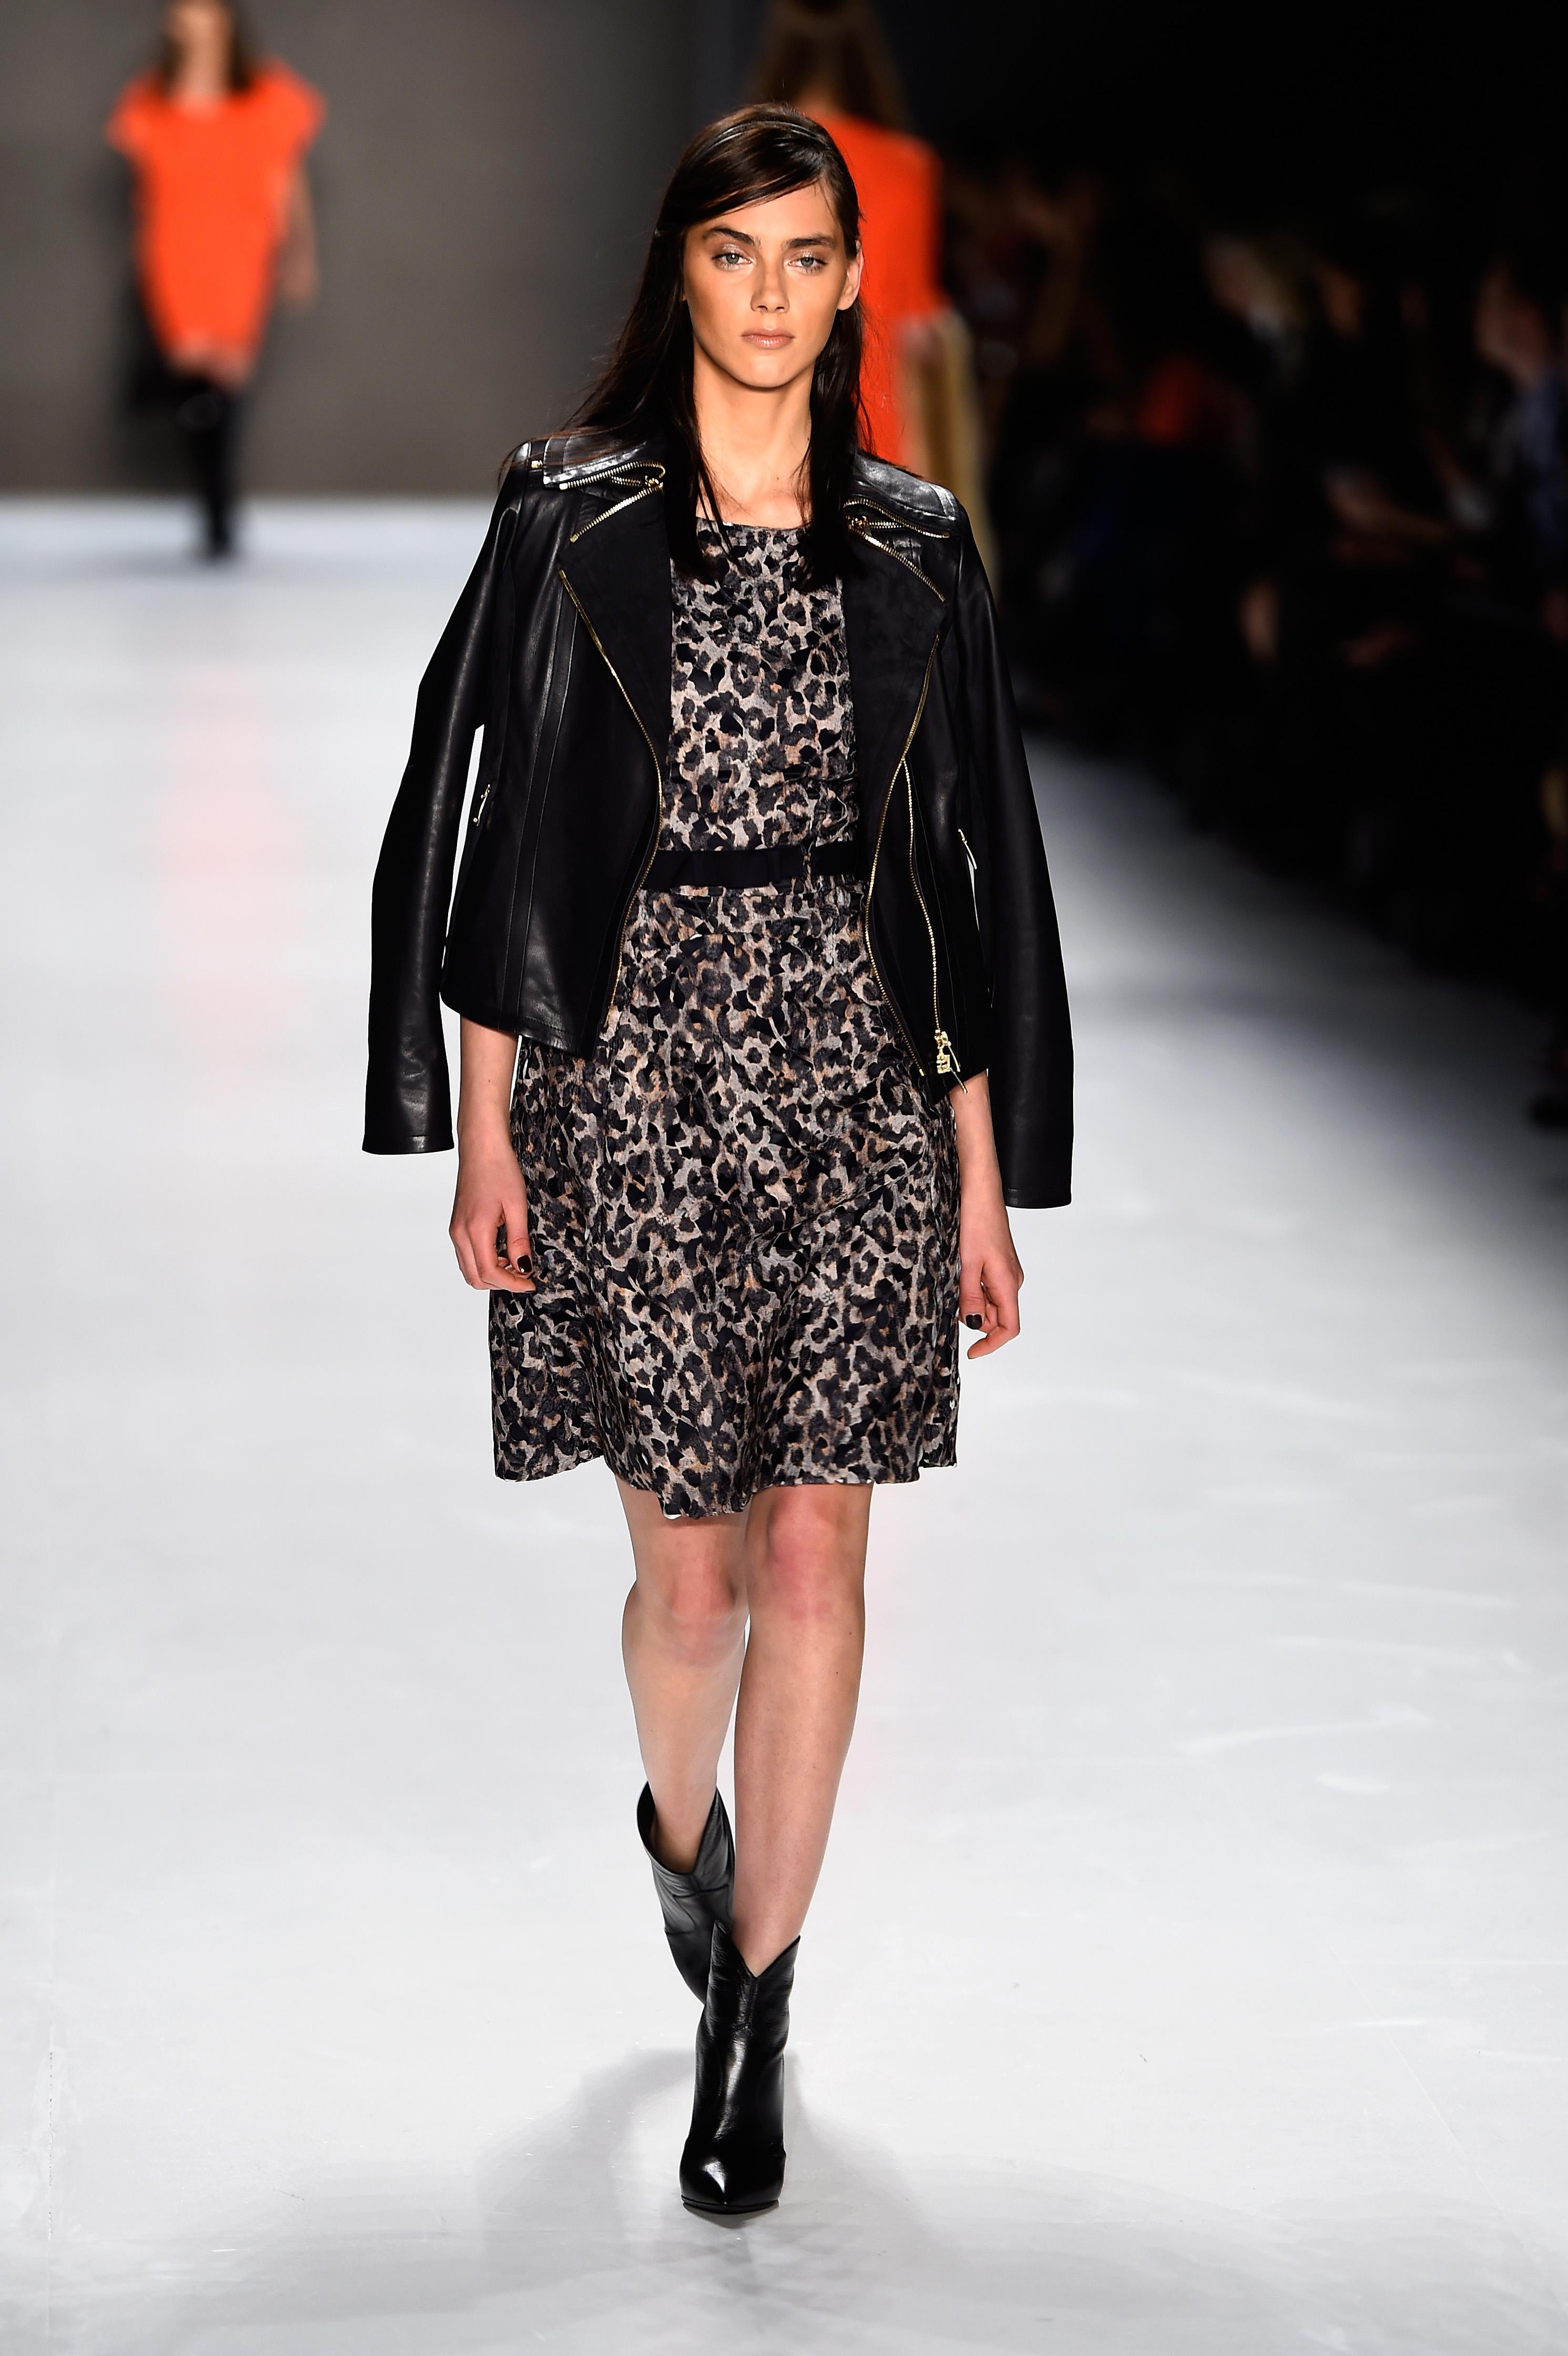 paris fashion week aw 2015 dates autos post. Black Bedroom Furniture Sets. Home Design Ideas